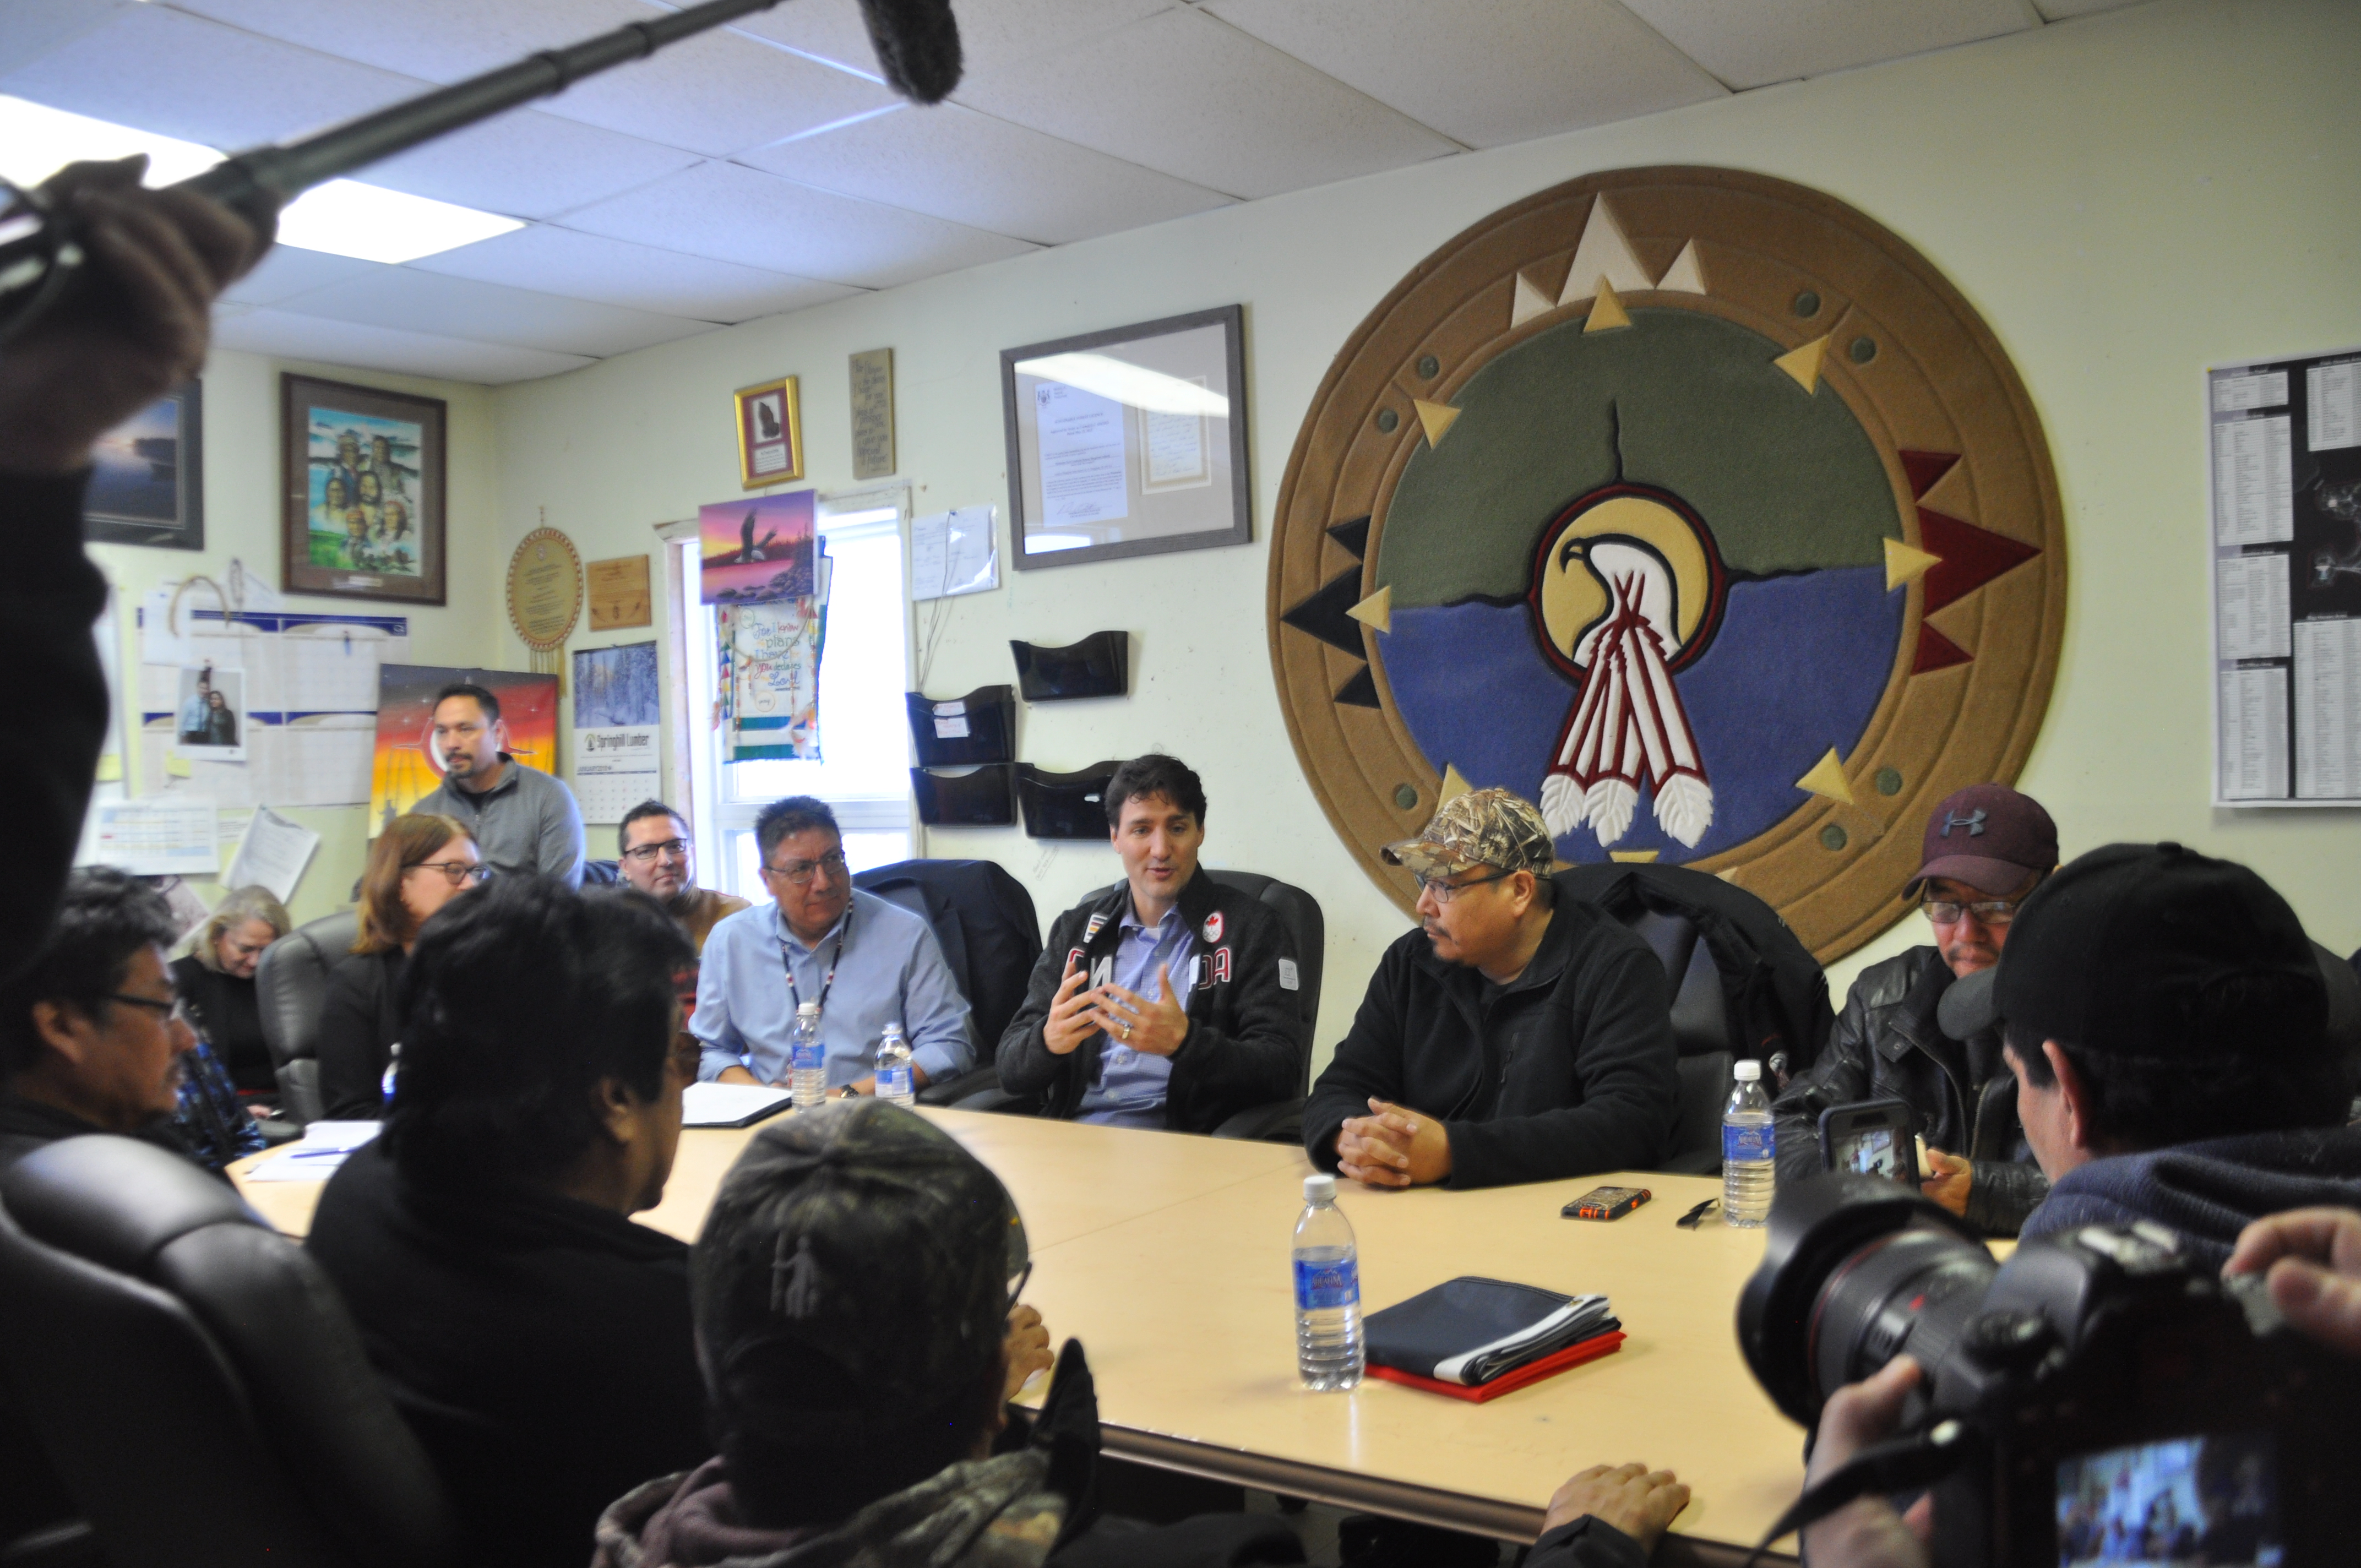 PM Trudeau visits Pikangikum First Nation | Wawatay News Online